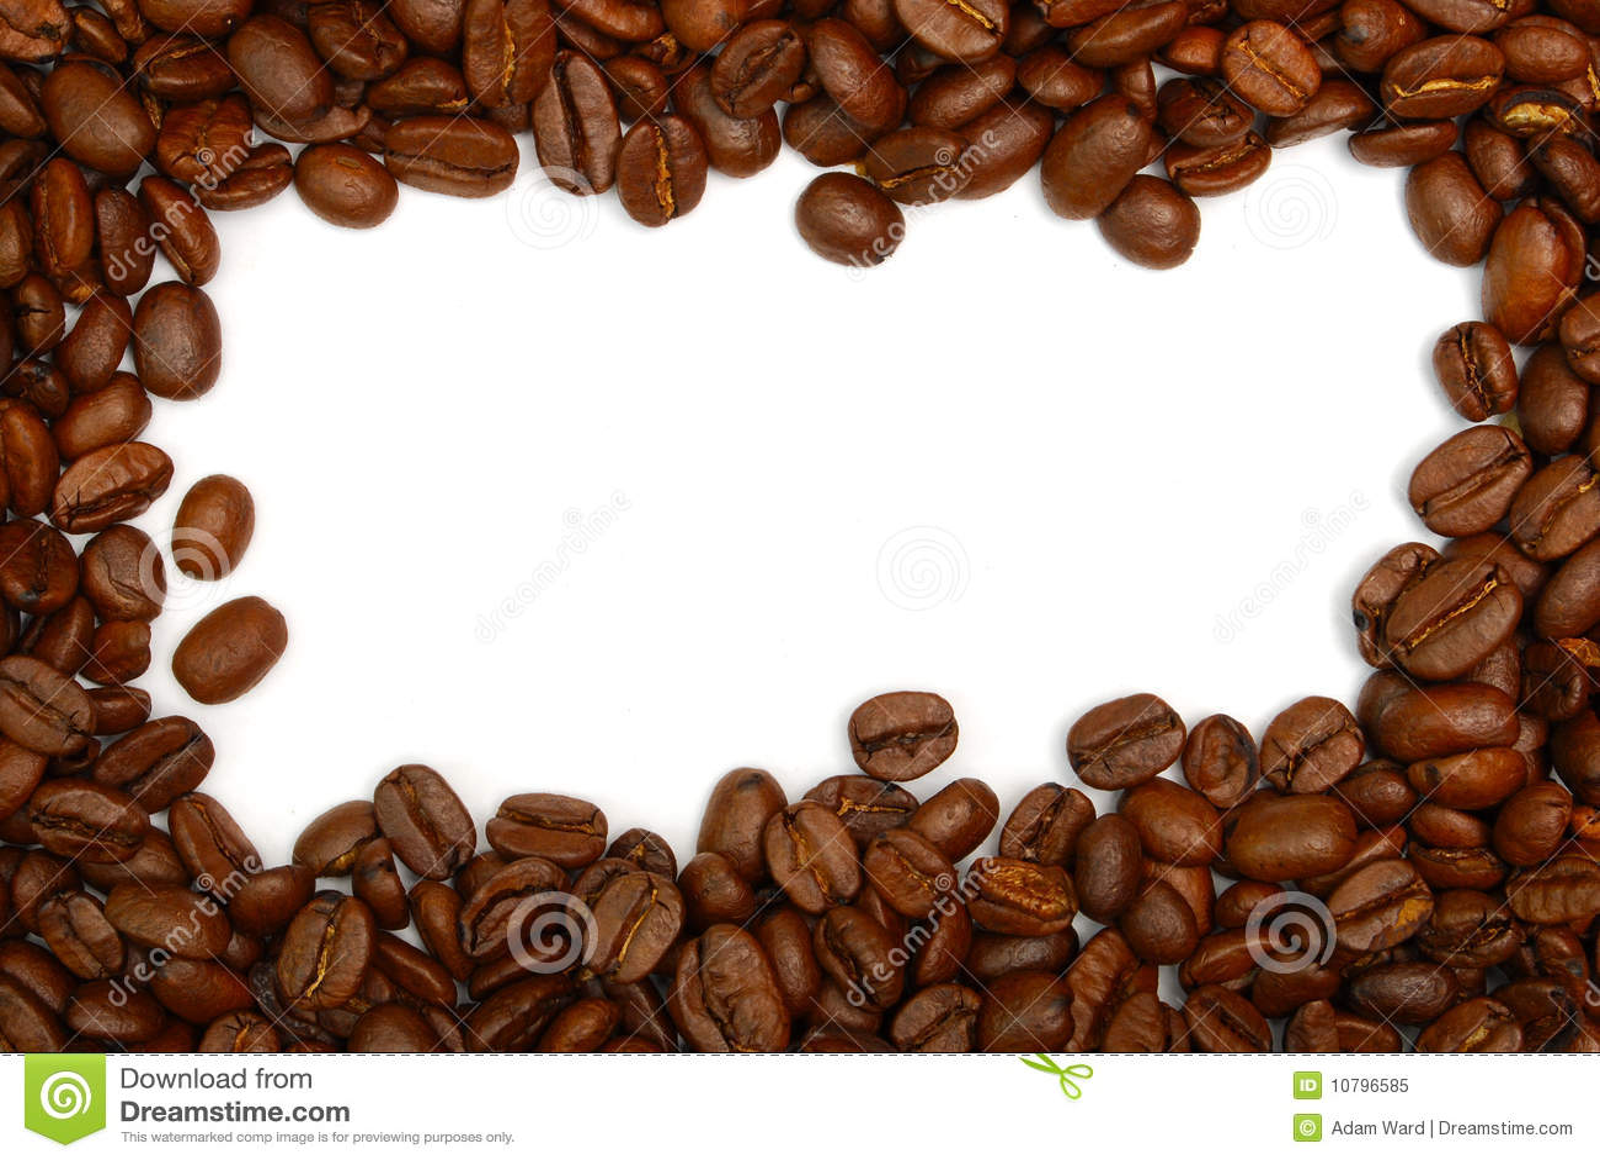 Coffee Bean Border ~ Coffee bean border stock image of food roasted